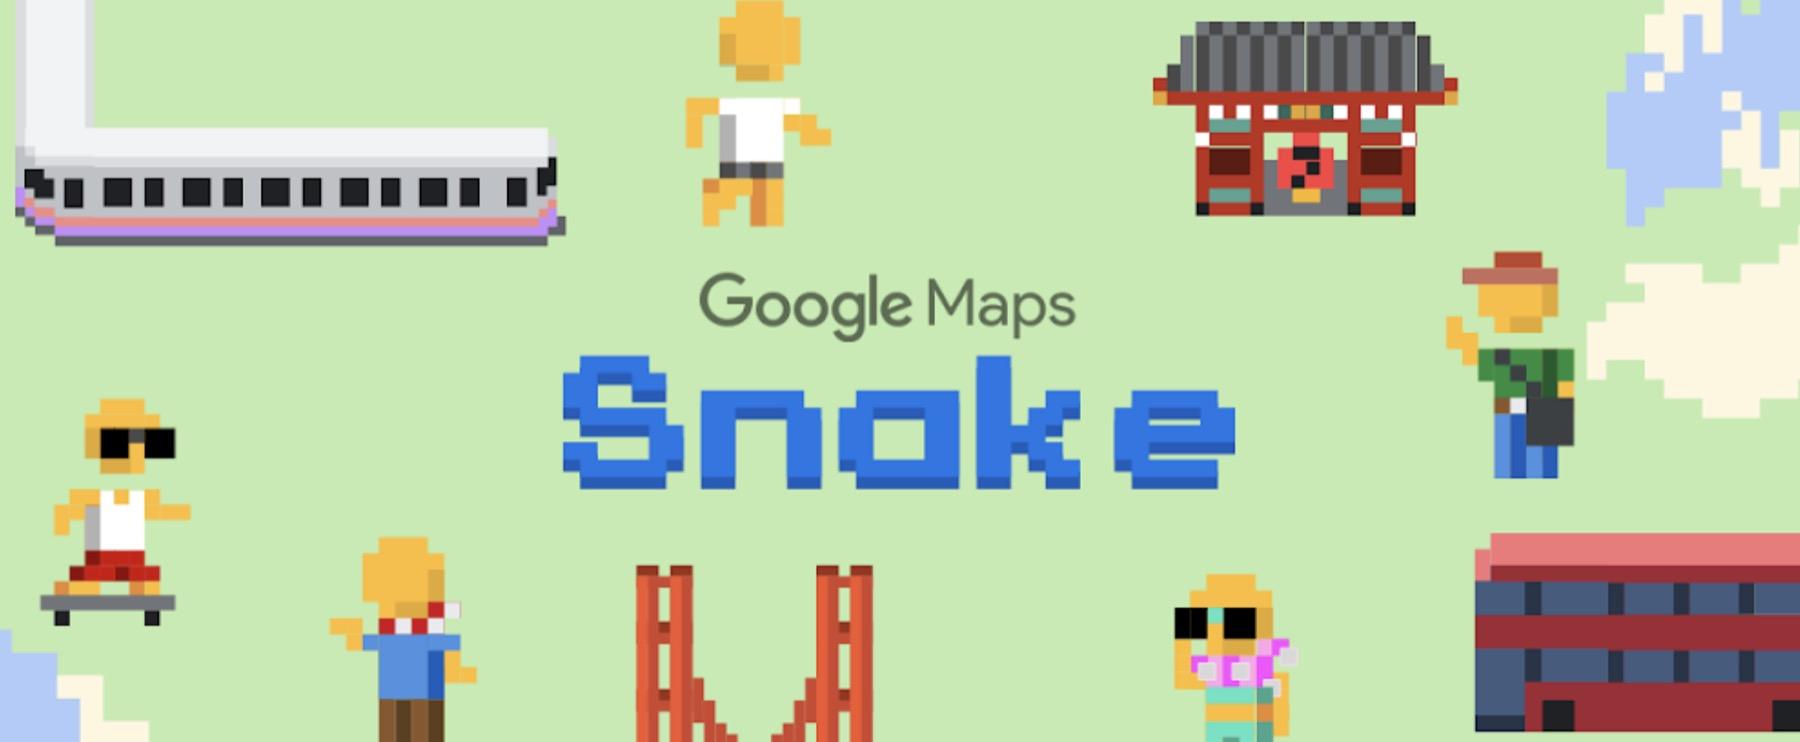 Snake Spielen Google